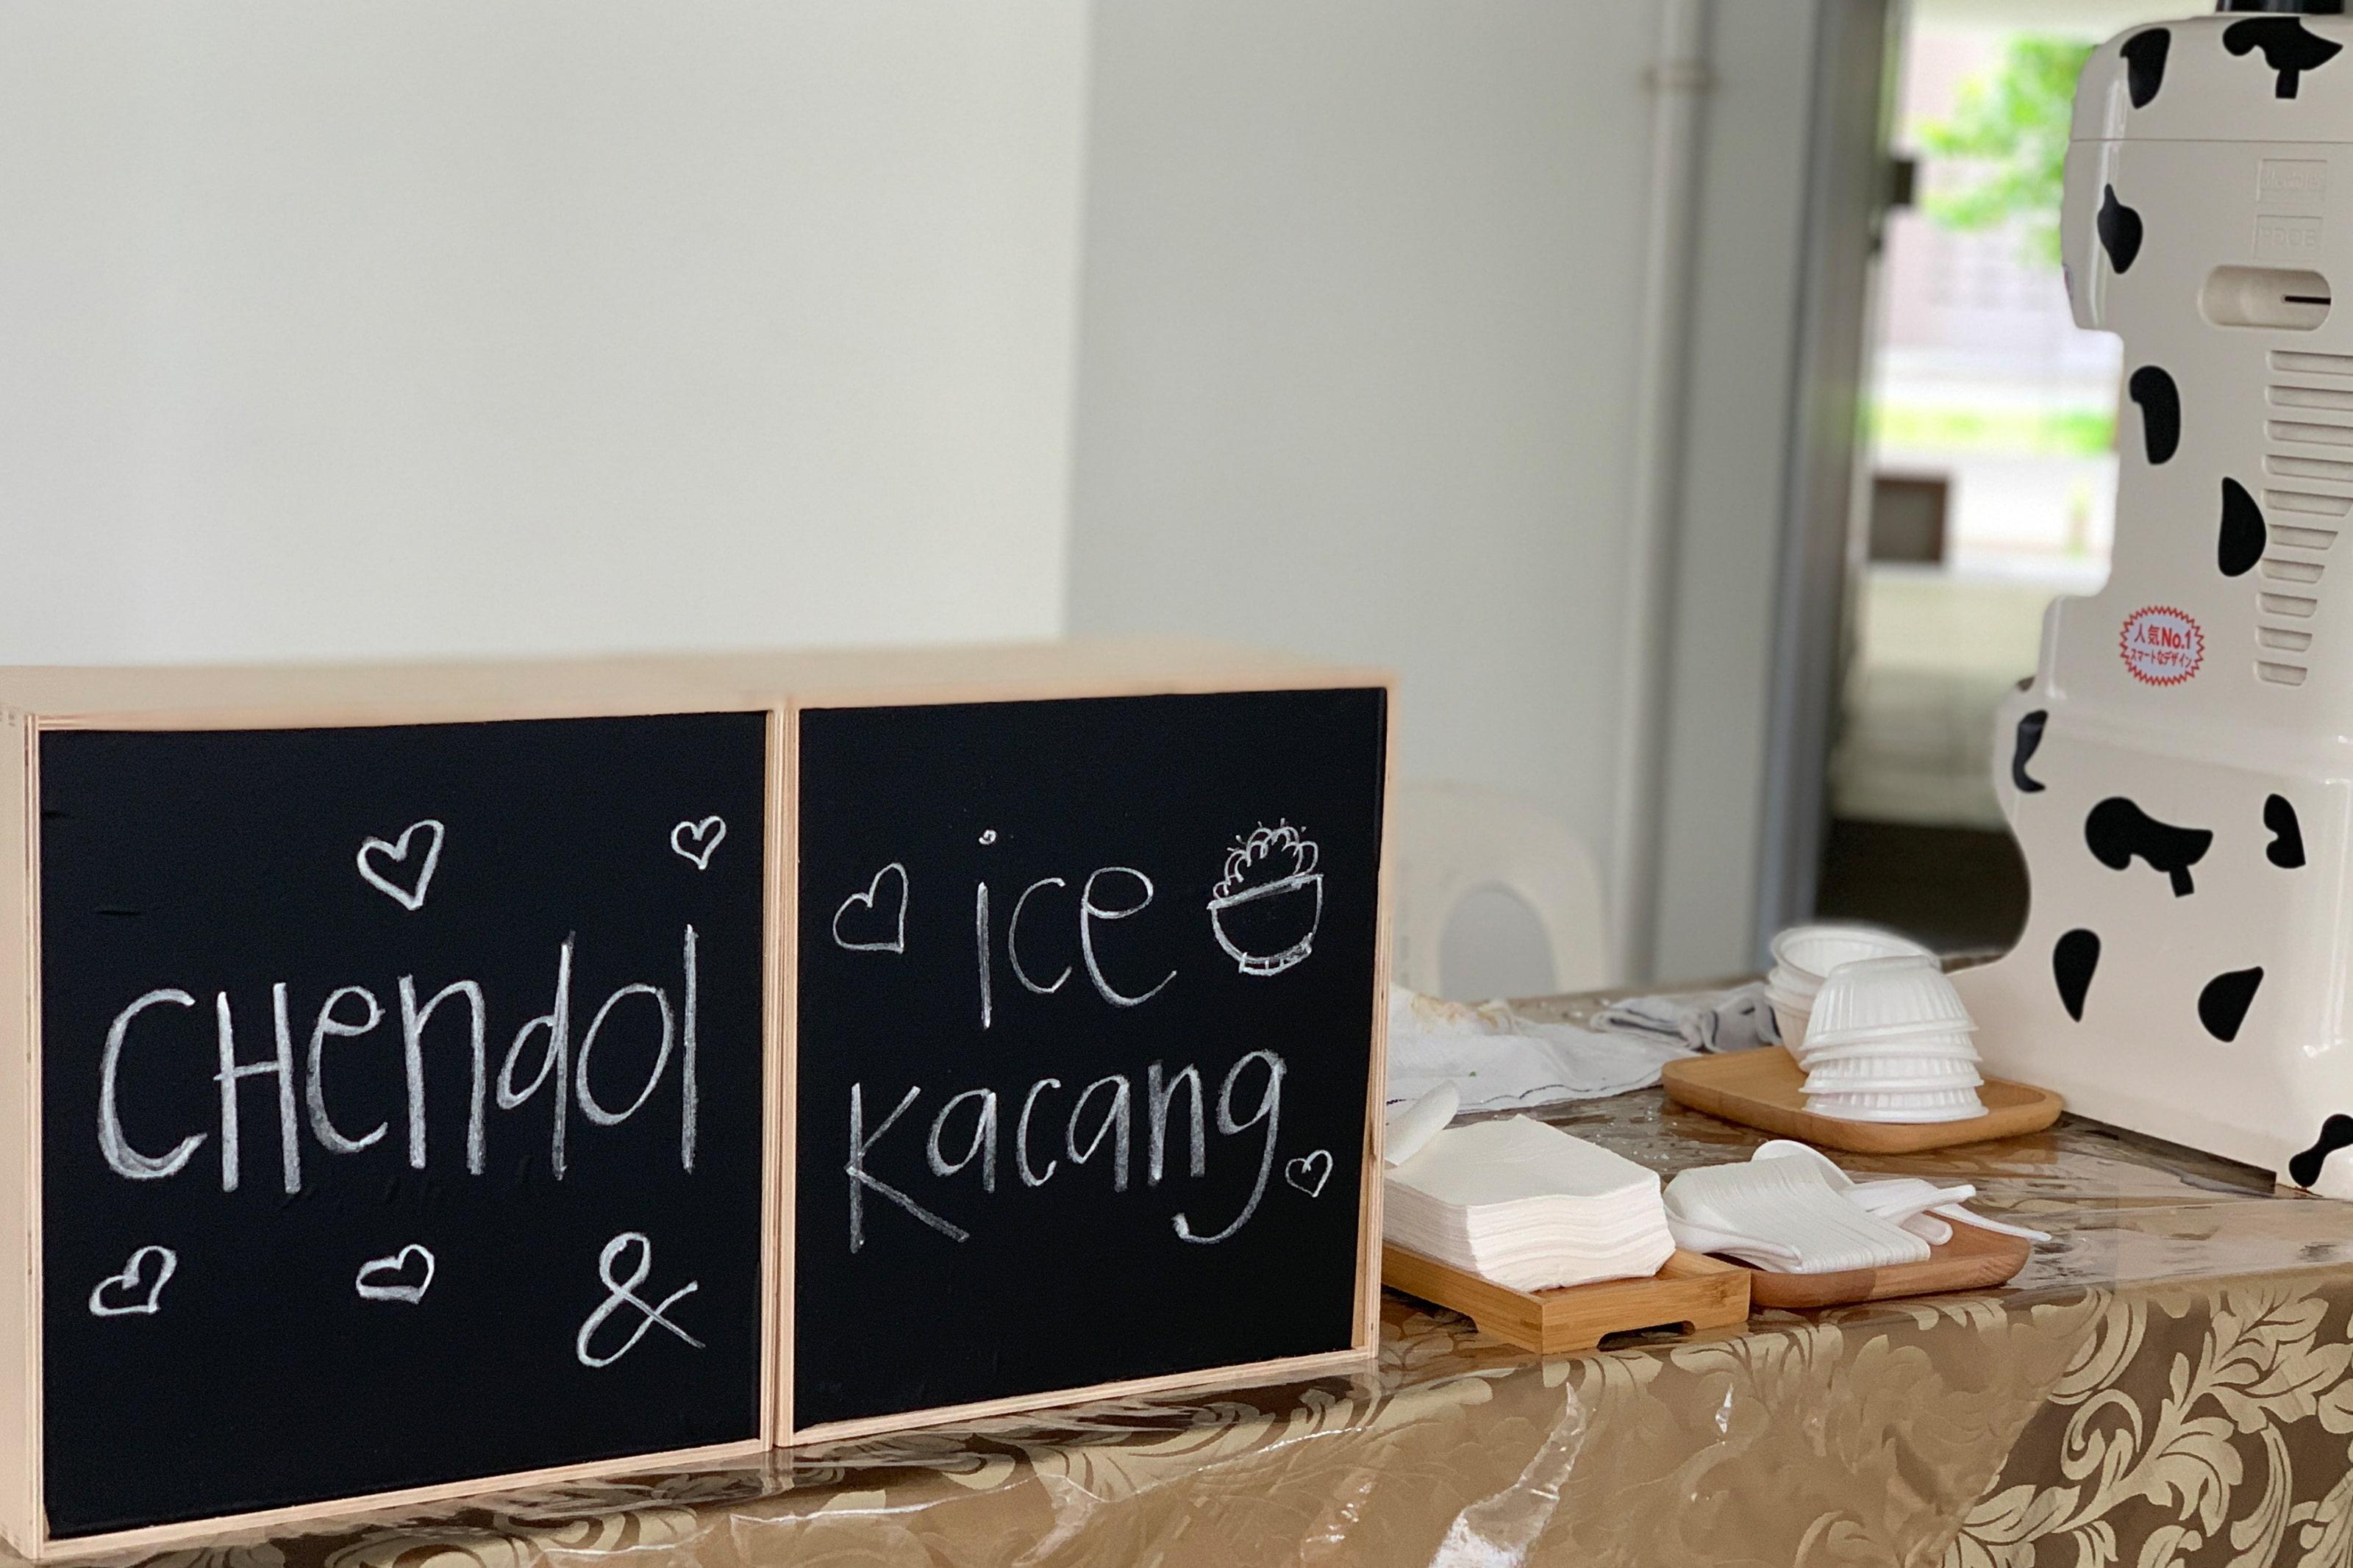 ice kacang and chendol